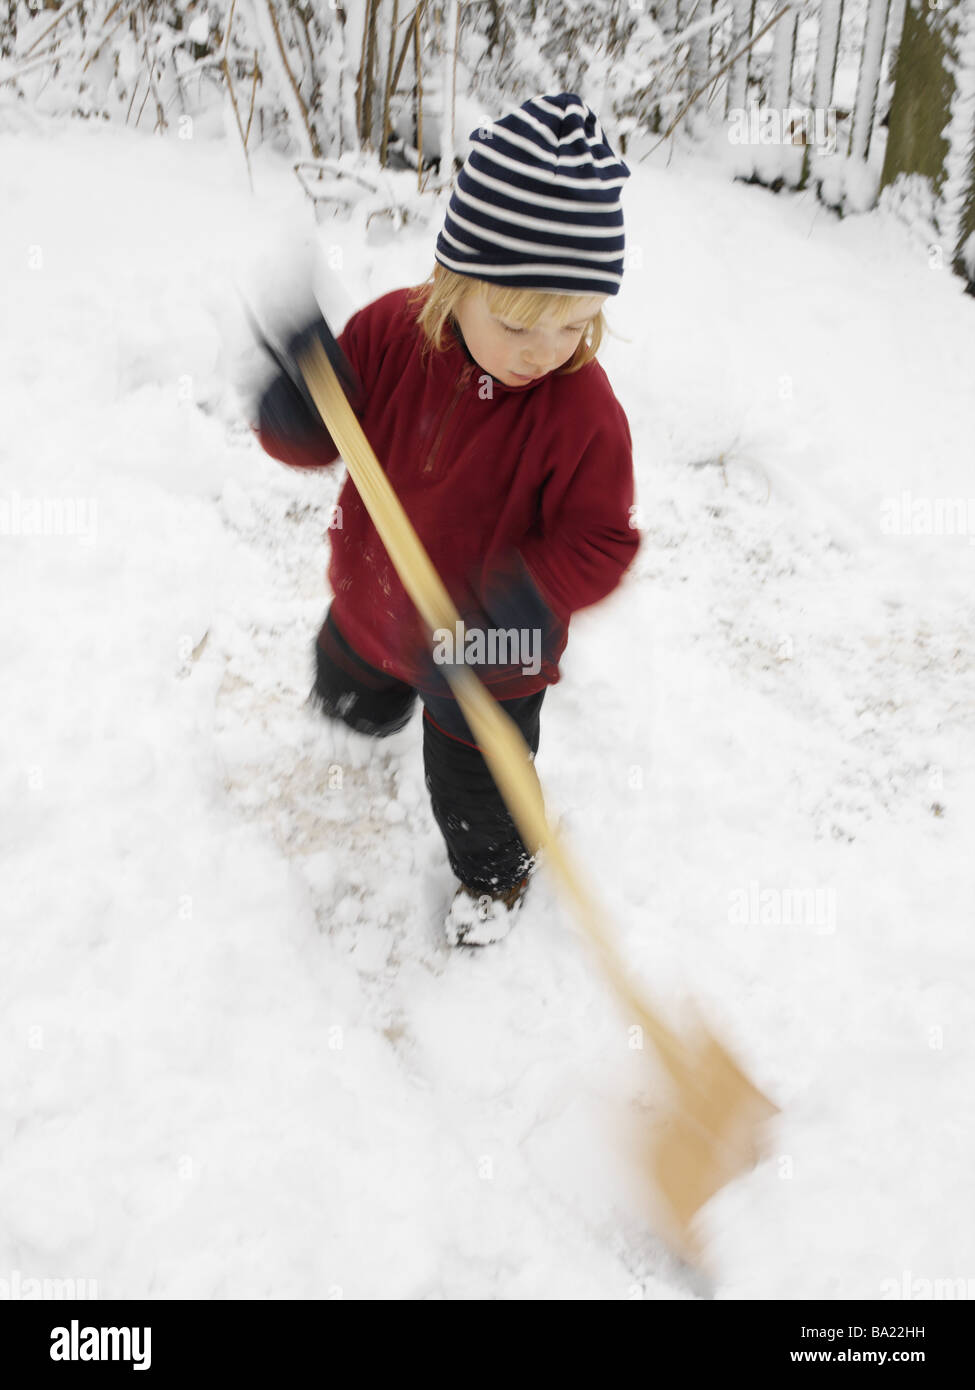 Give birth winter-clothing snow-shovels 4 years child blond ski-pants sweaters cap snow-shovel shovel shovels snow - Stock Image